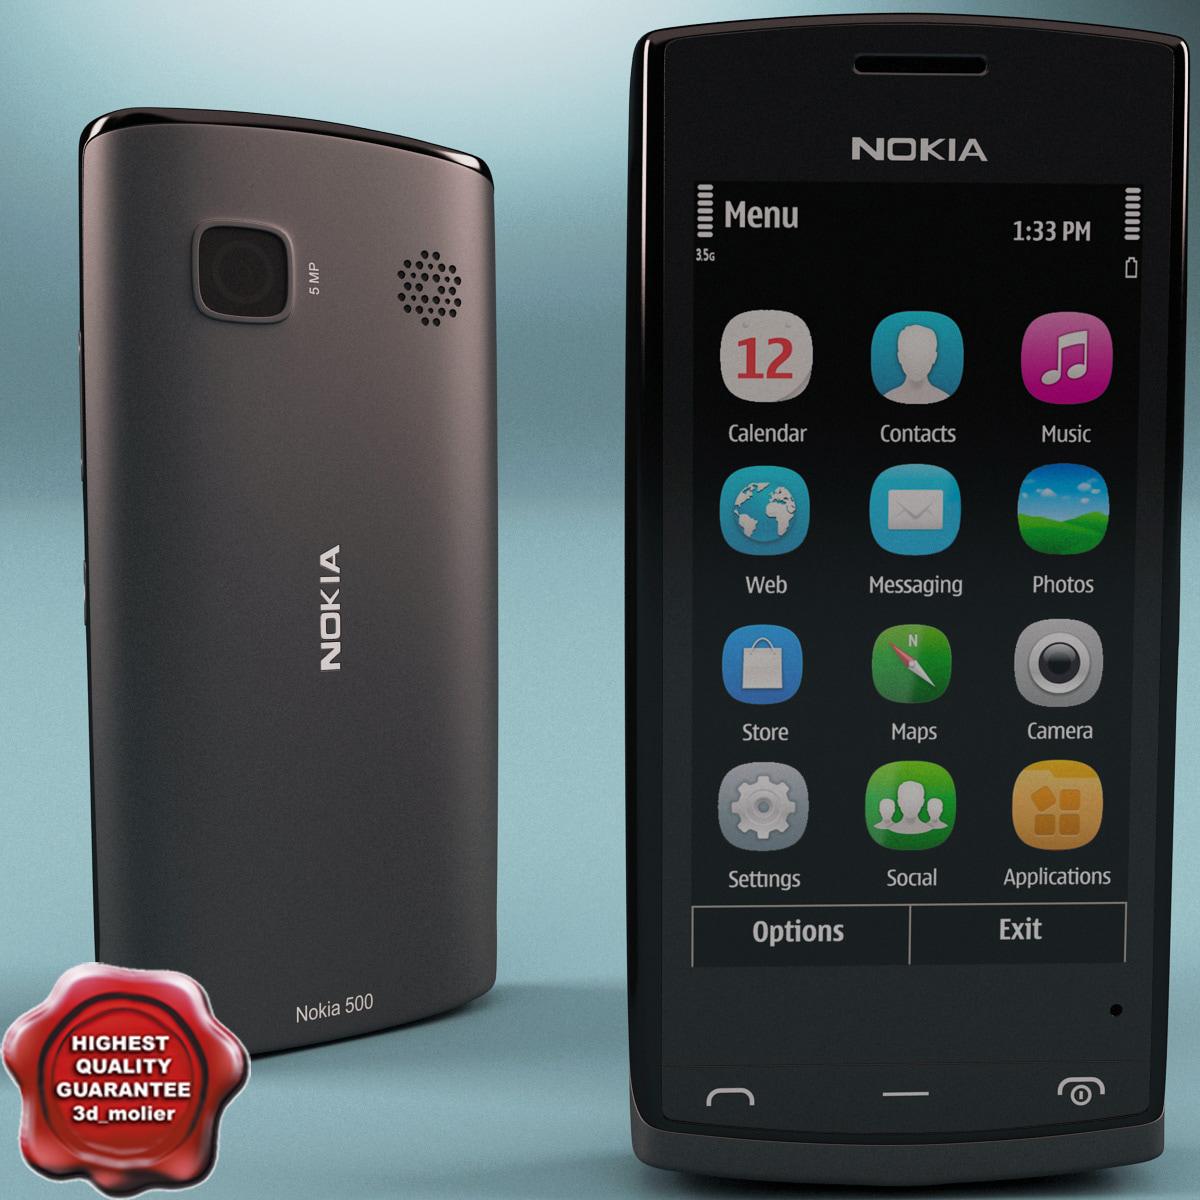 Nokia_500_Black_00.jpg